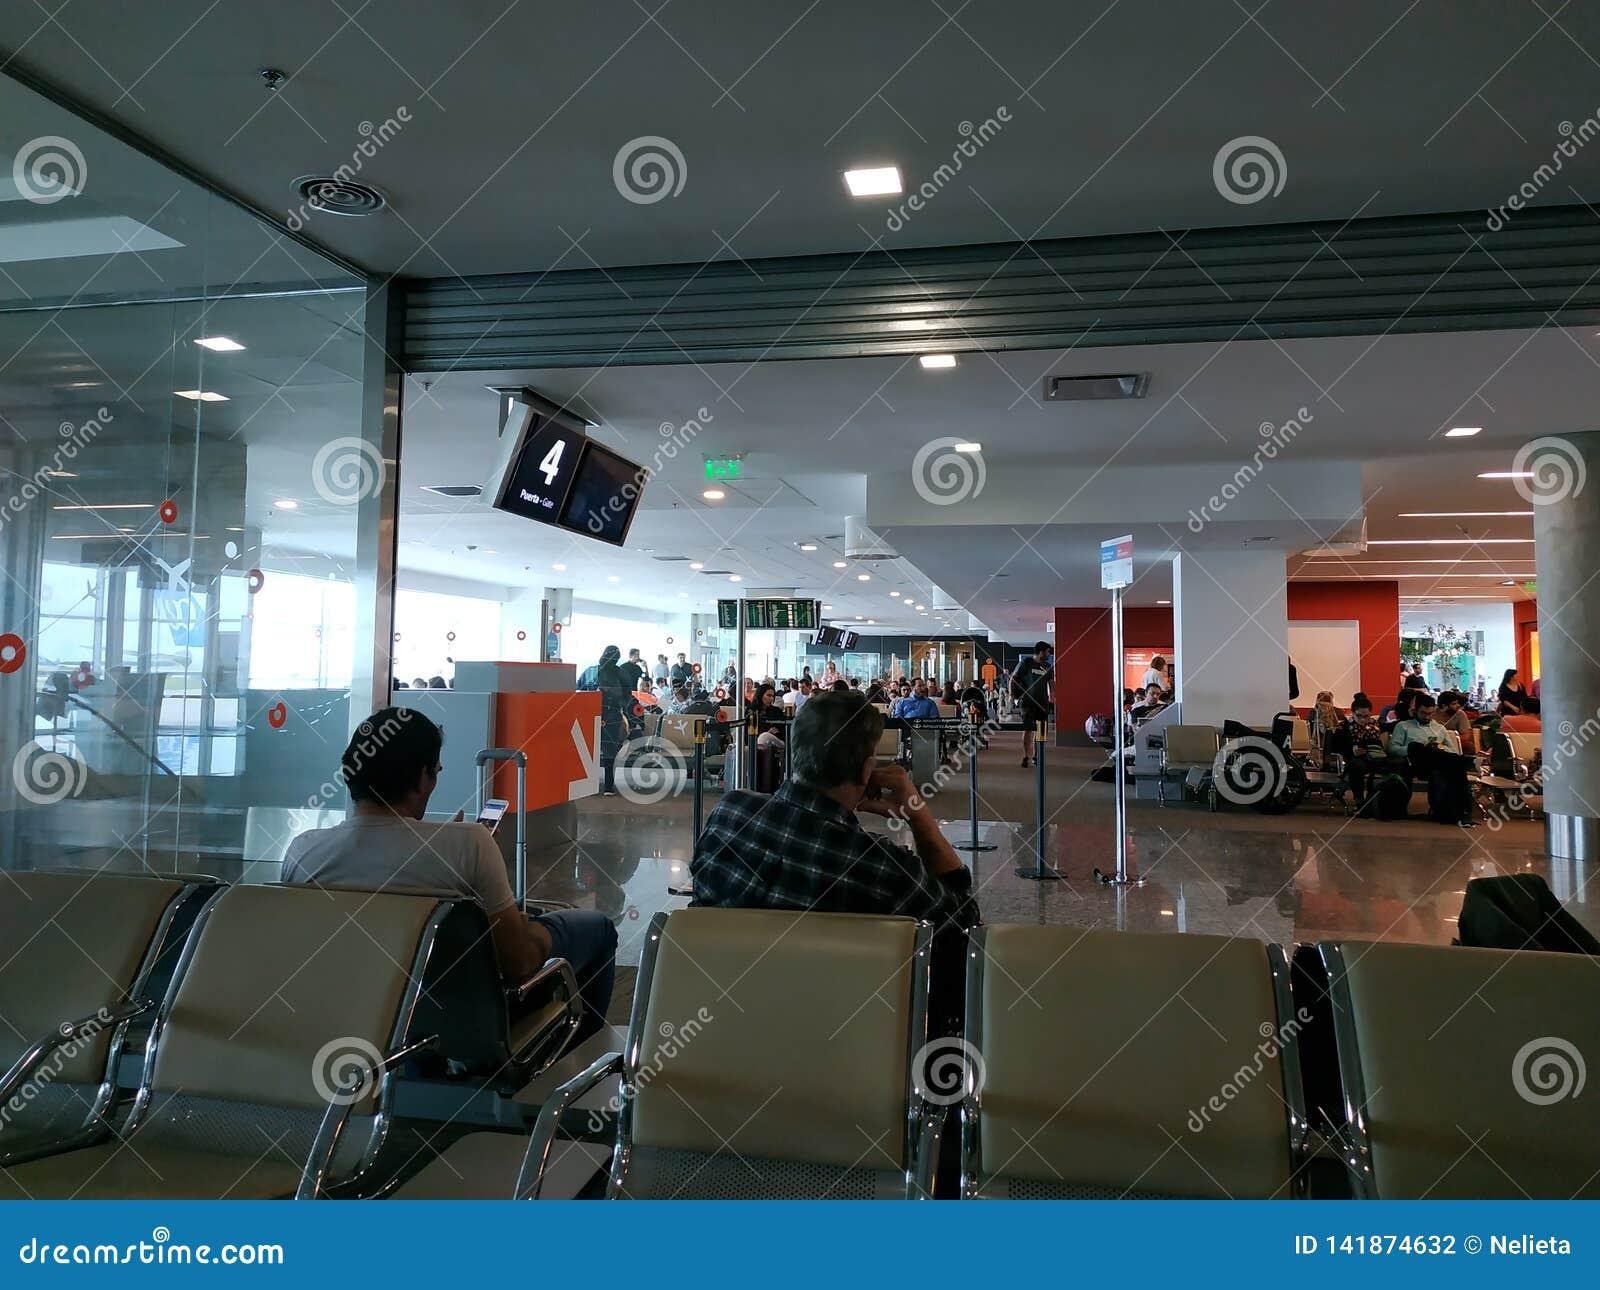 Pajas Youtube pajas blancas córdoba international airport in argentina